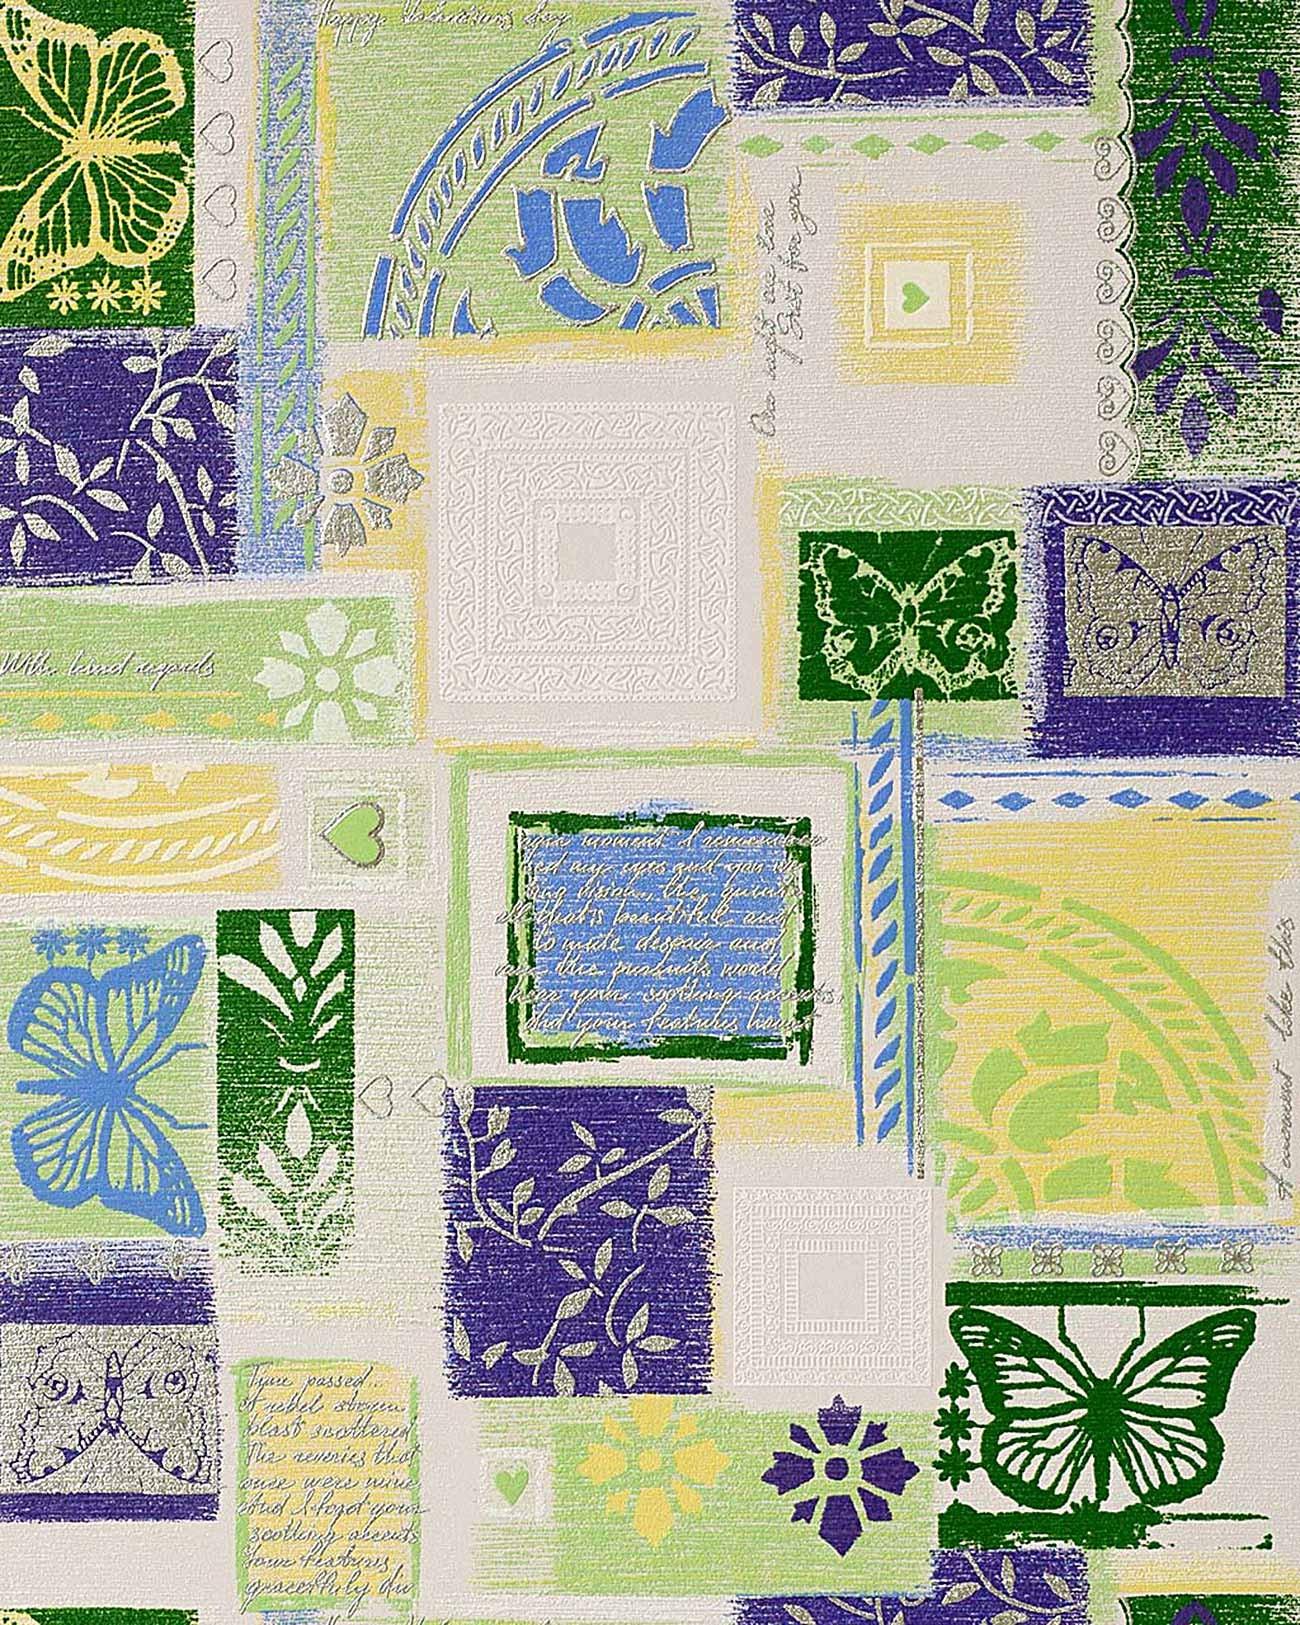 papier peint design r tro style edem 071 25 scrapbooking blanc vert violet argent 5 33 m2. Black Bedroom Furniture Sets. Home Design Ideas